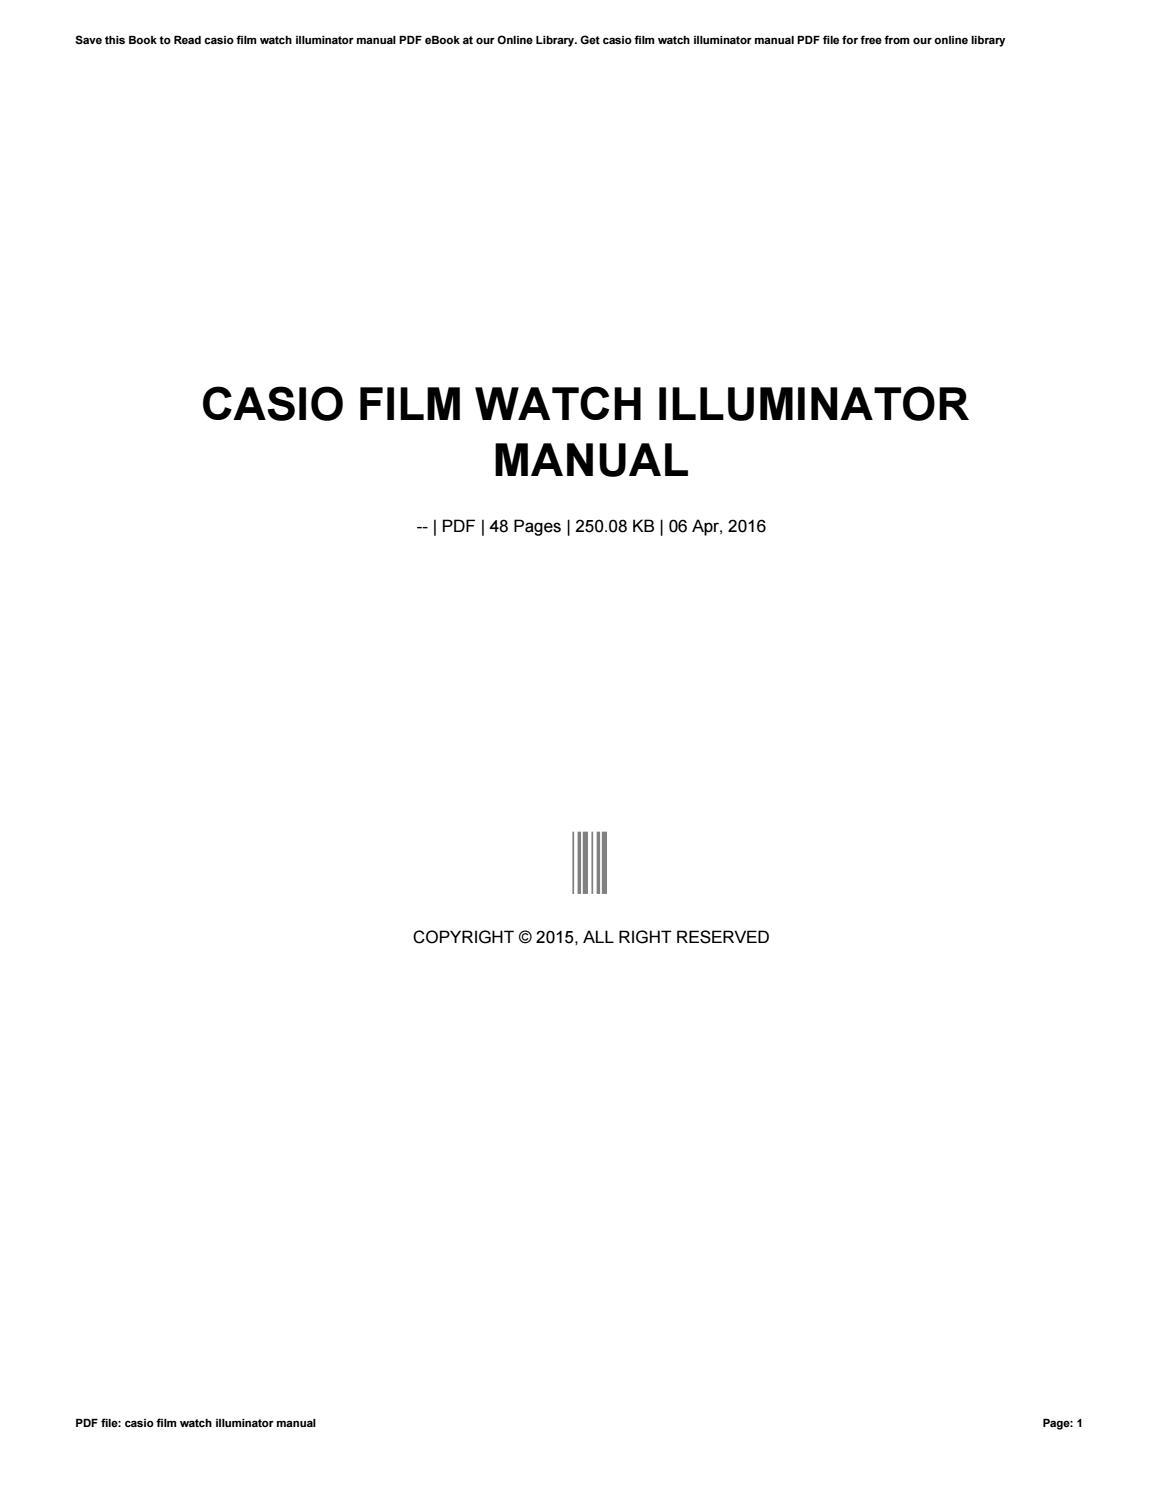 ... Array - casio illuminator manual one word quickstart guide book u2022  rh gradinet com